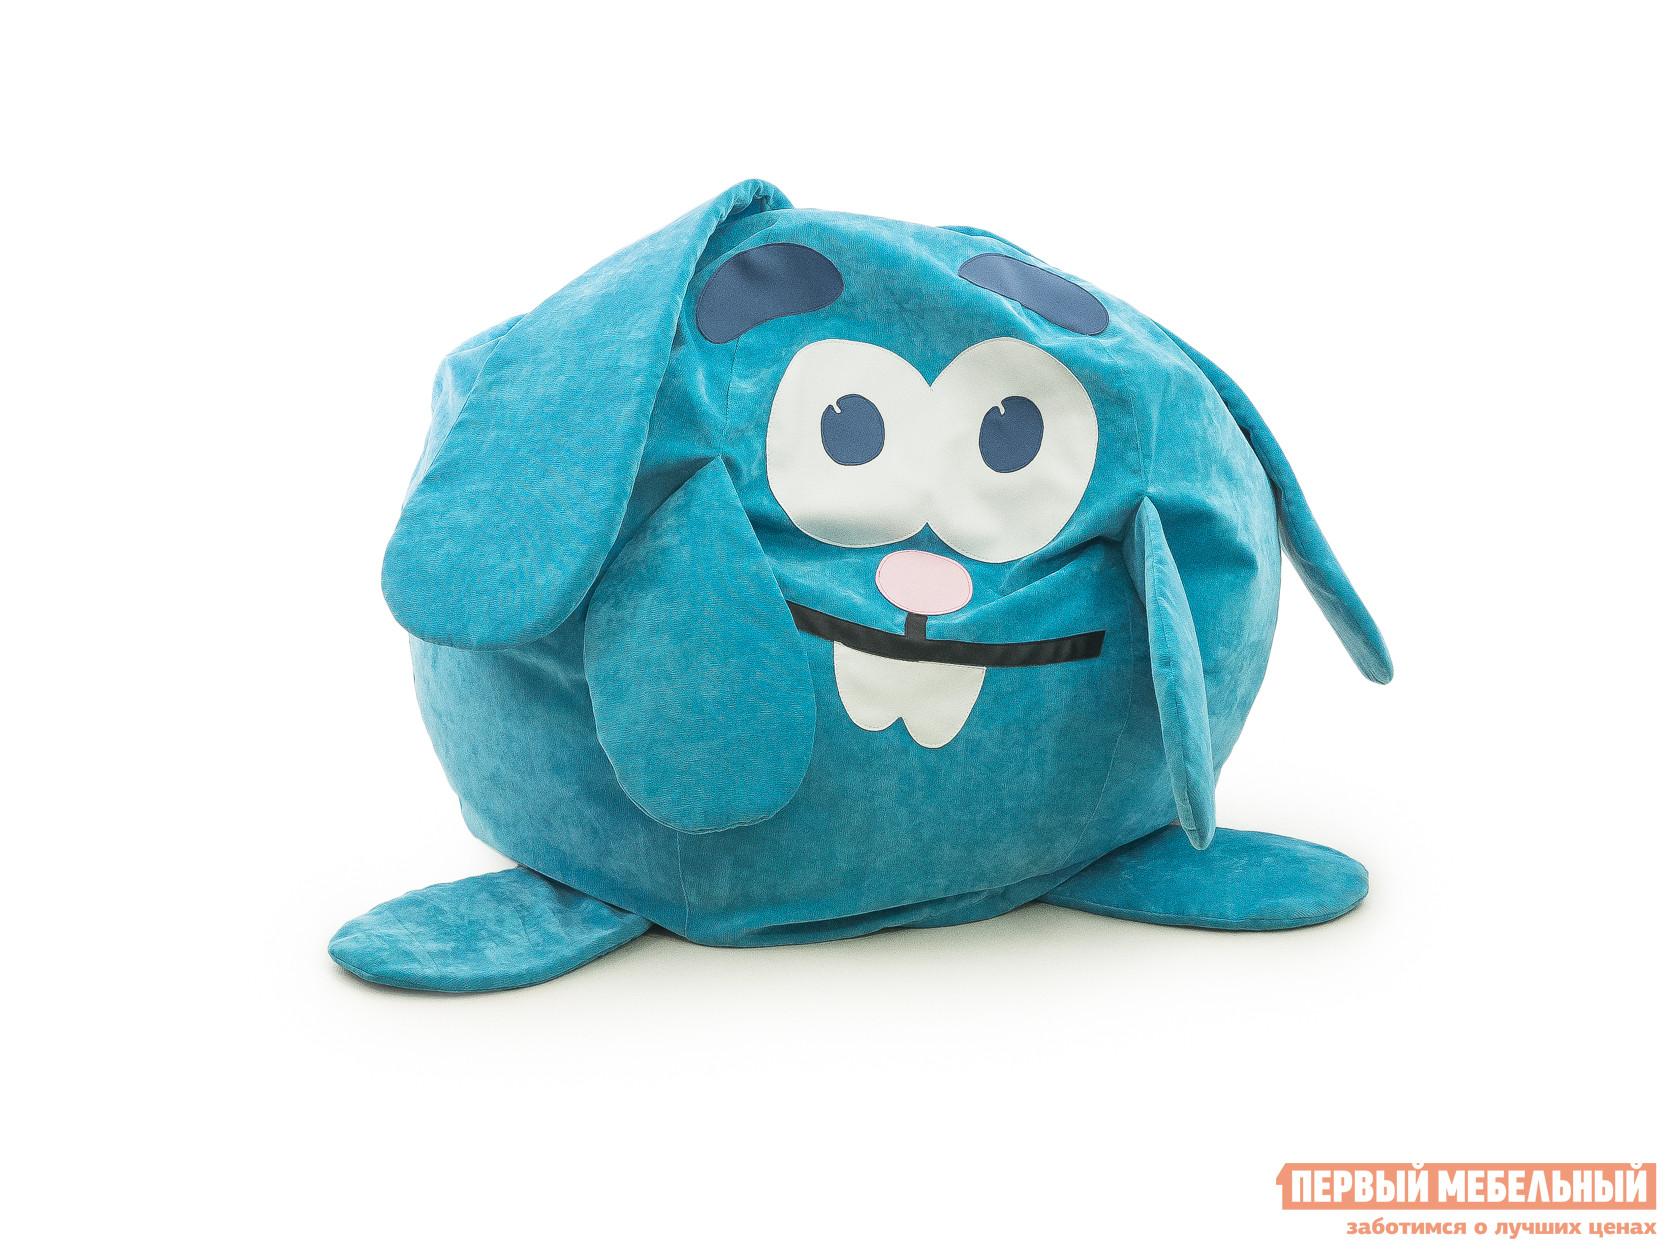 Кресло-мешок DreamBag Заяц Голубой